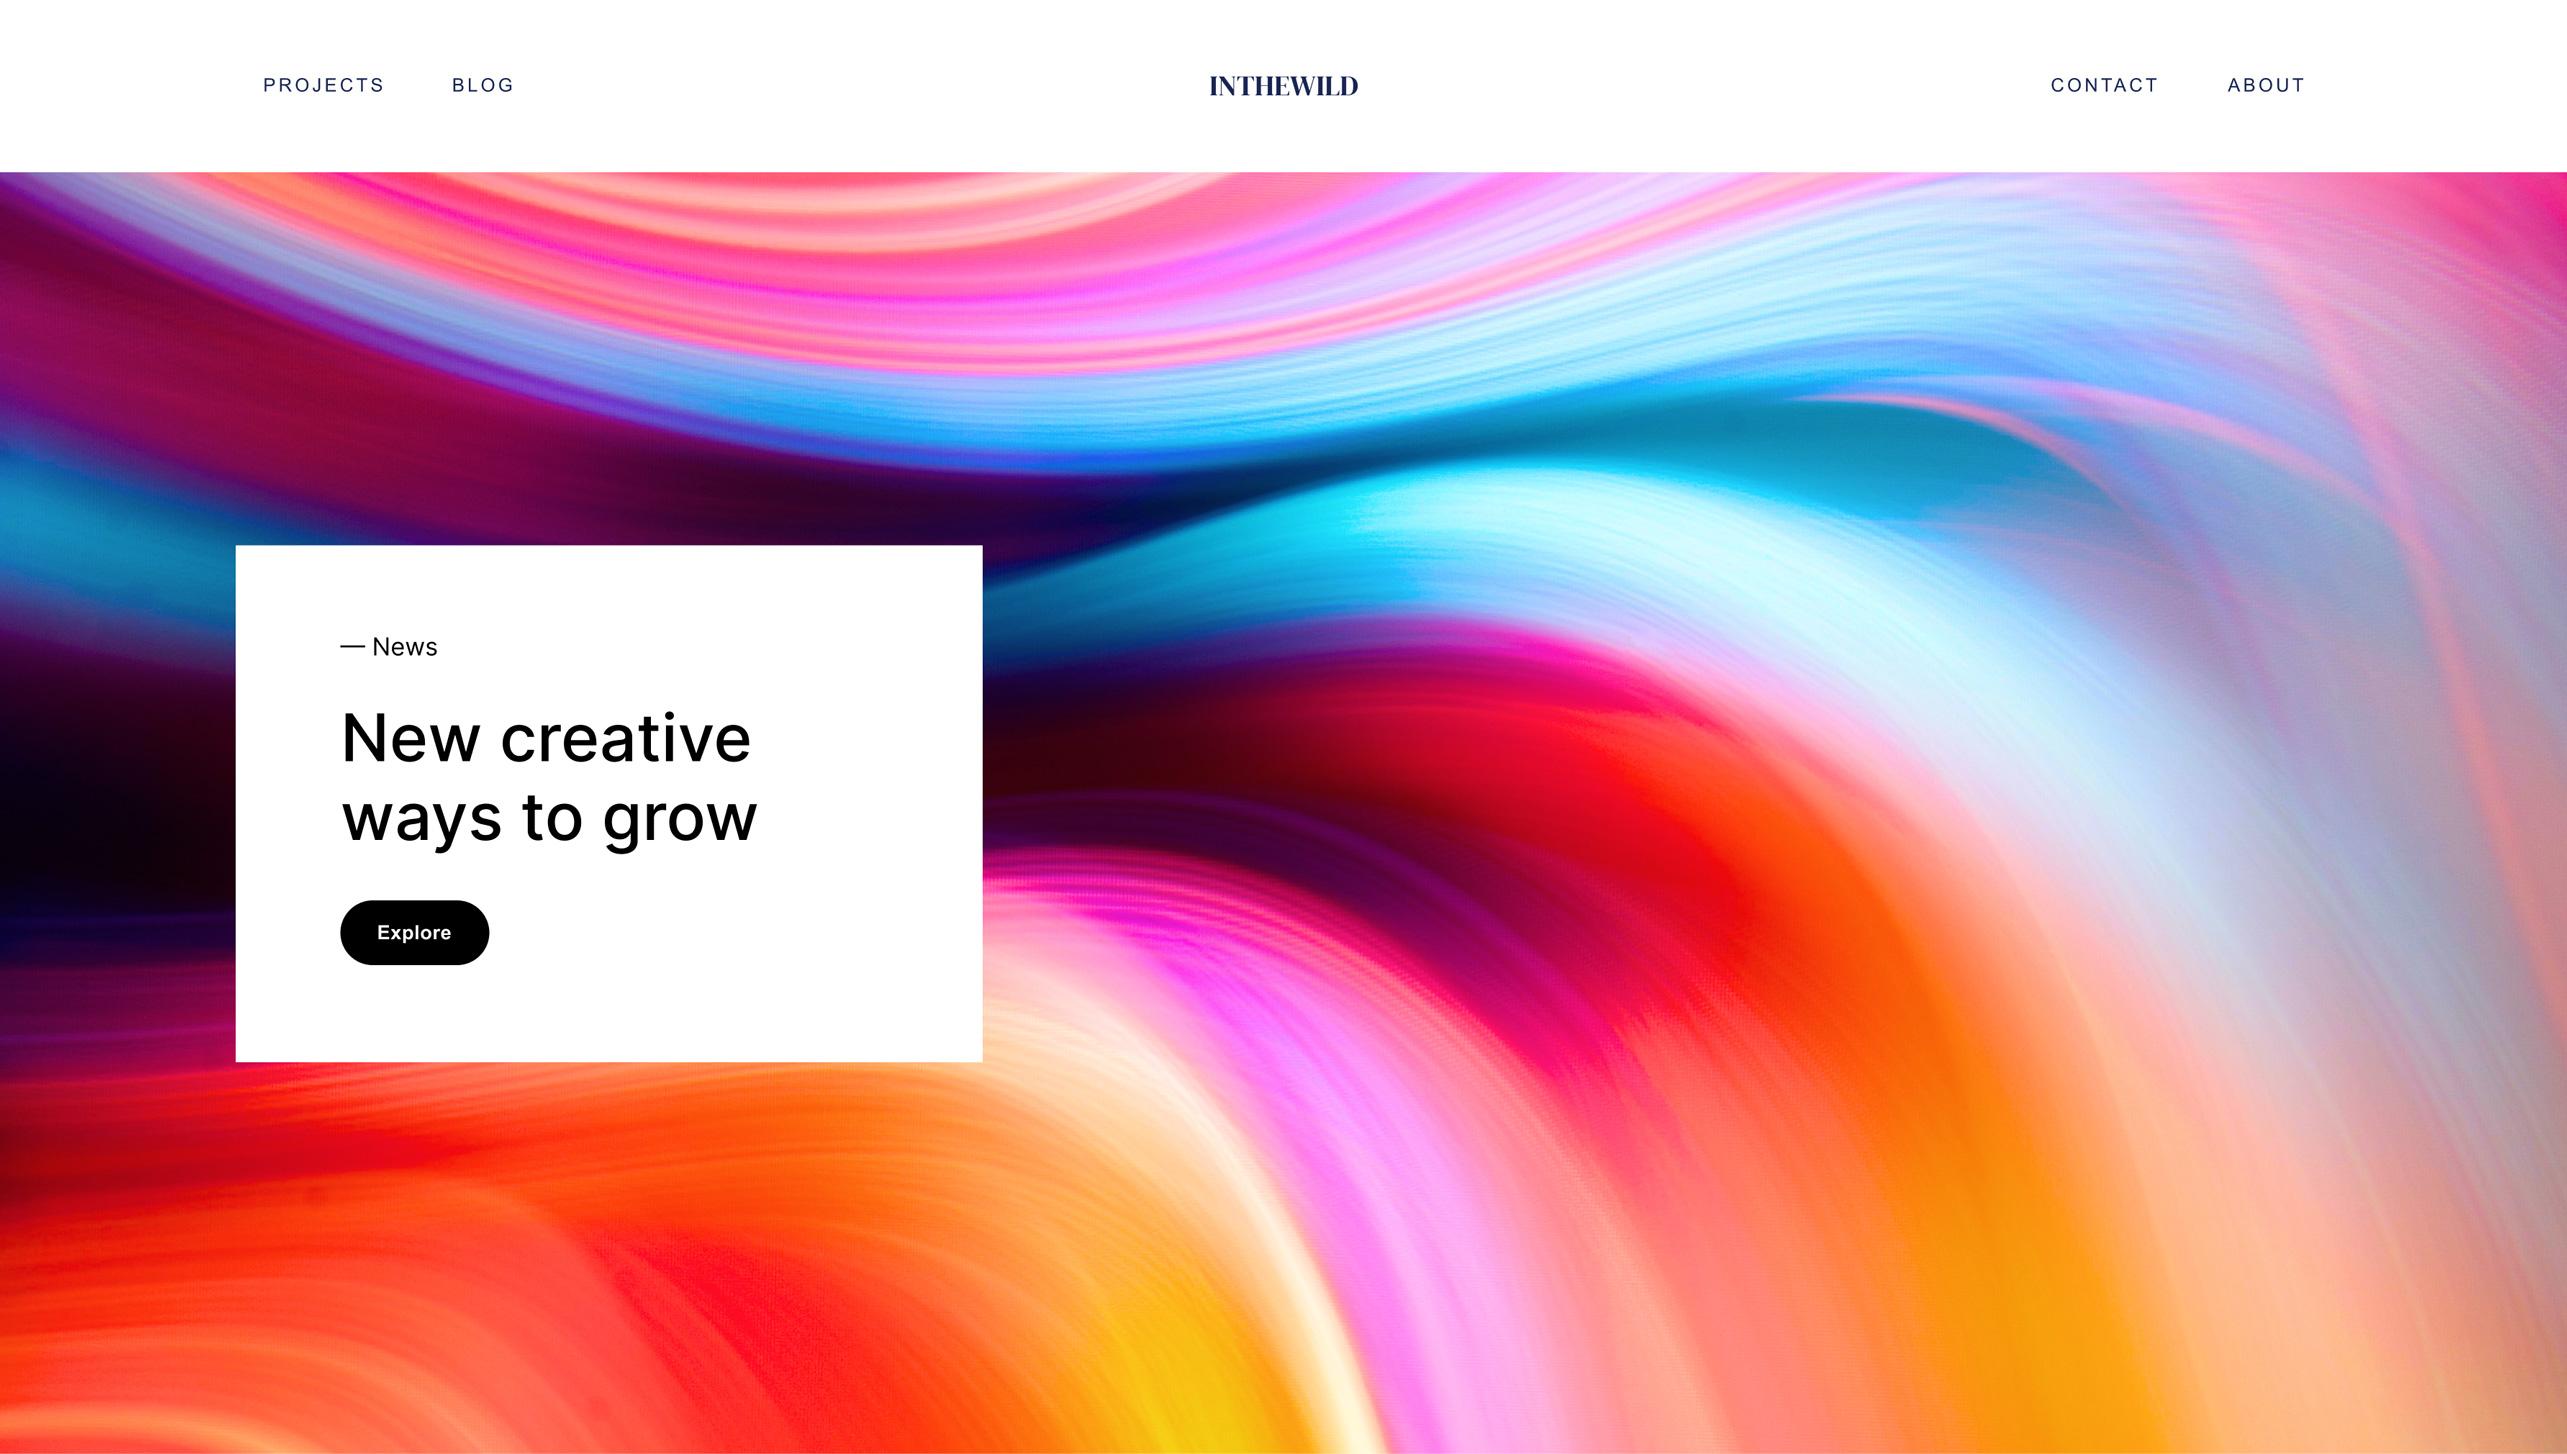 Website project screenshot